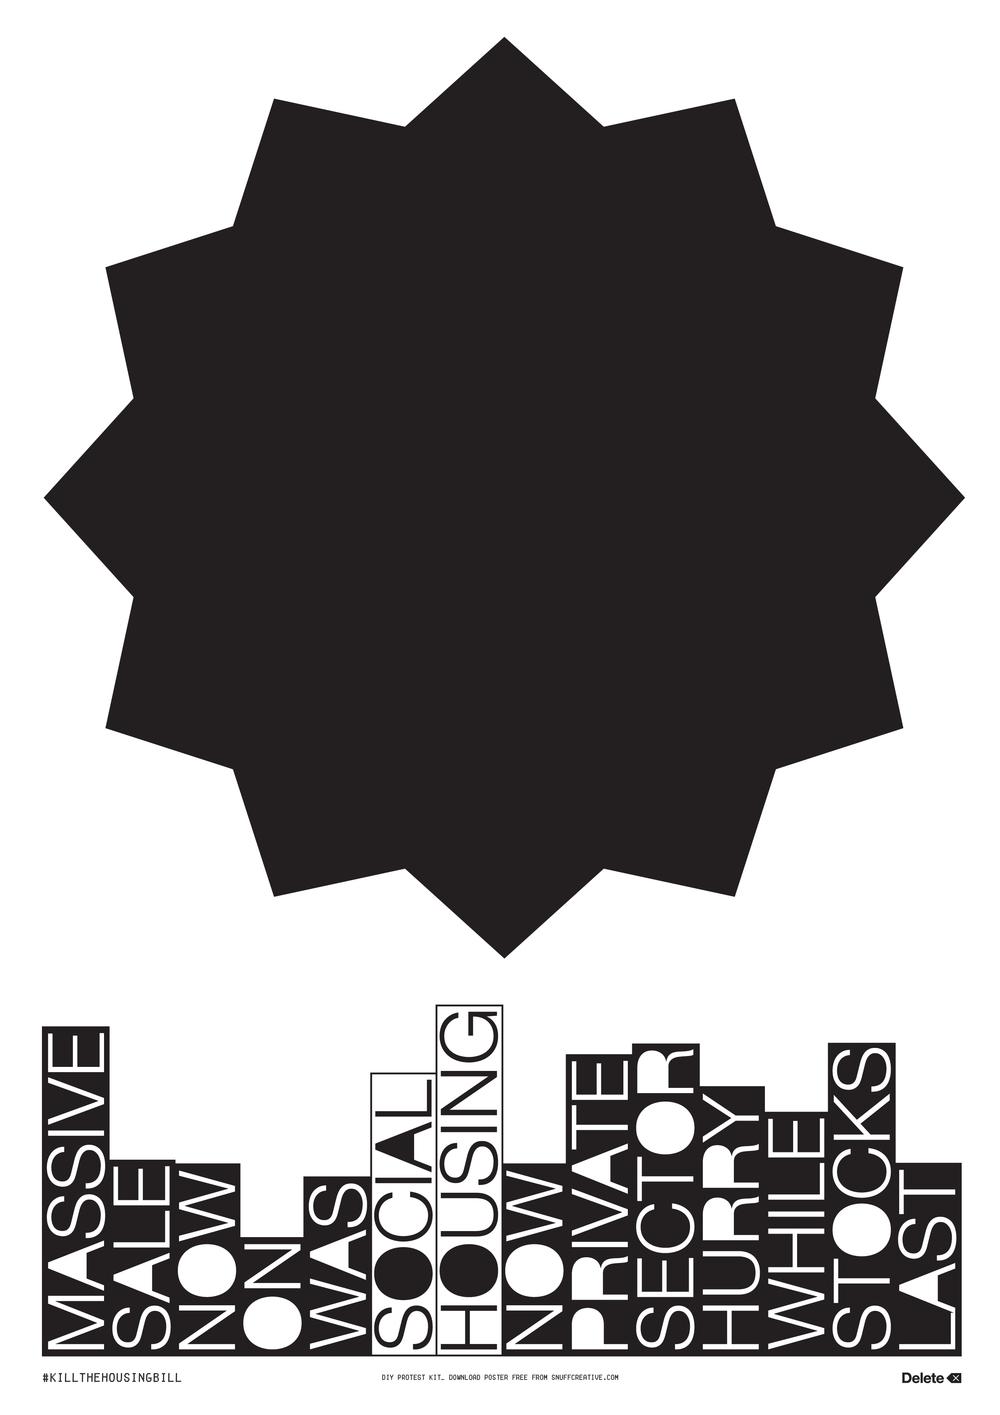 MASSIVE SALE TYPE POSTER_BLACK-03.jpg